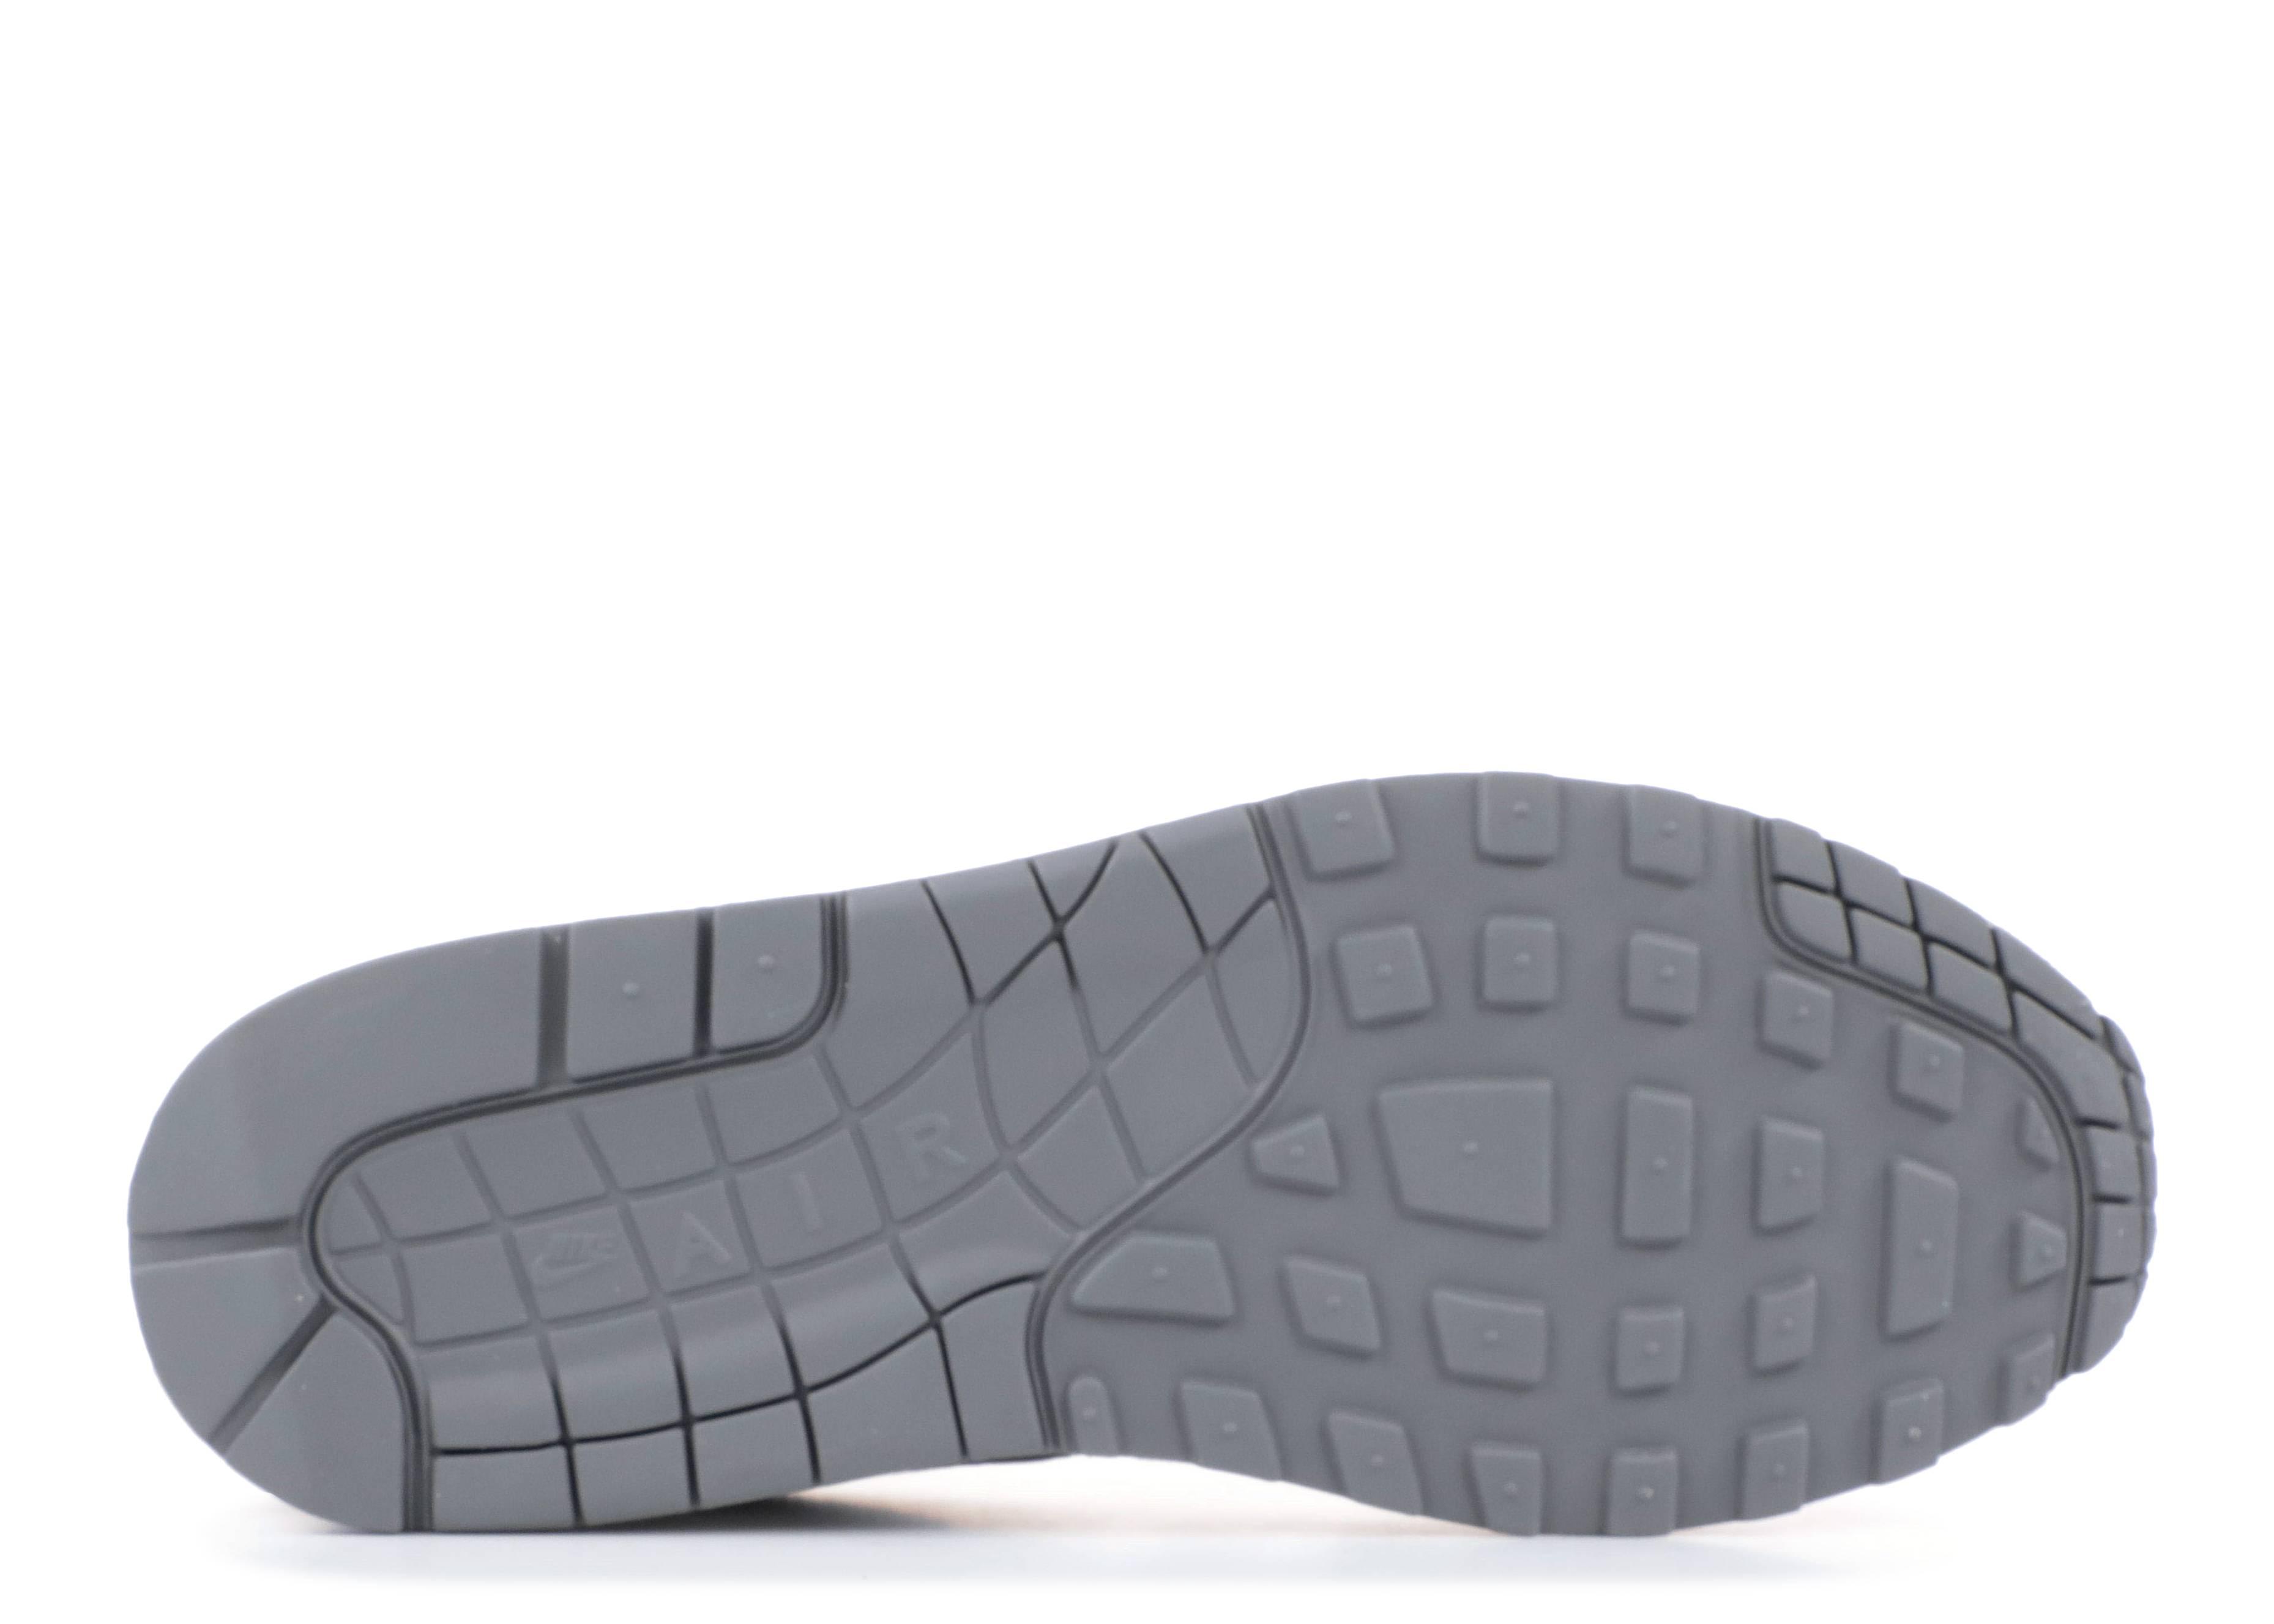 new concept f511a 17b07 Nike Air Max 1 Premium - Nike - 875844 005 - cool grey wolf grey-white    Flight Club